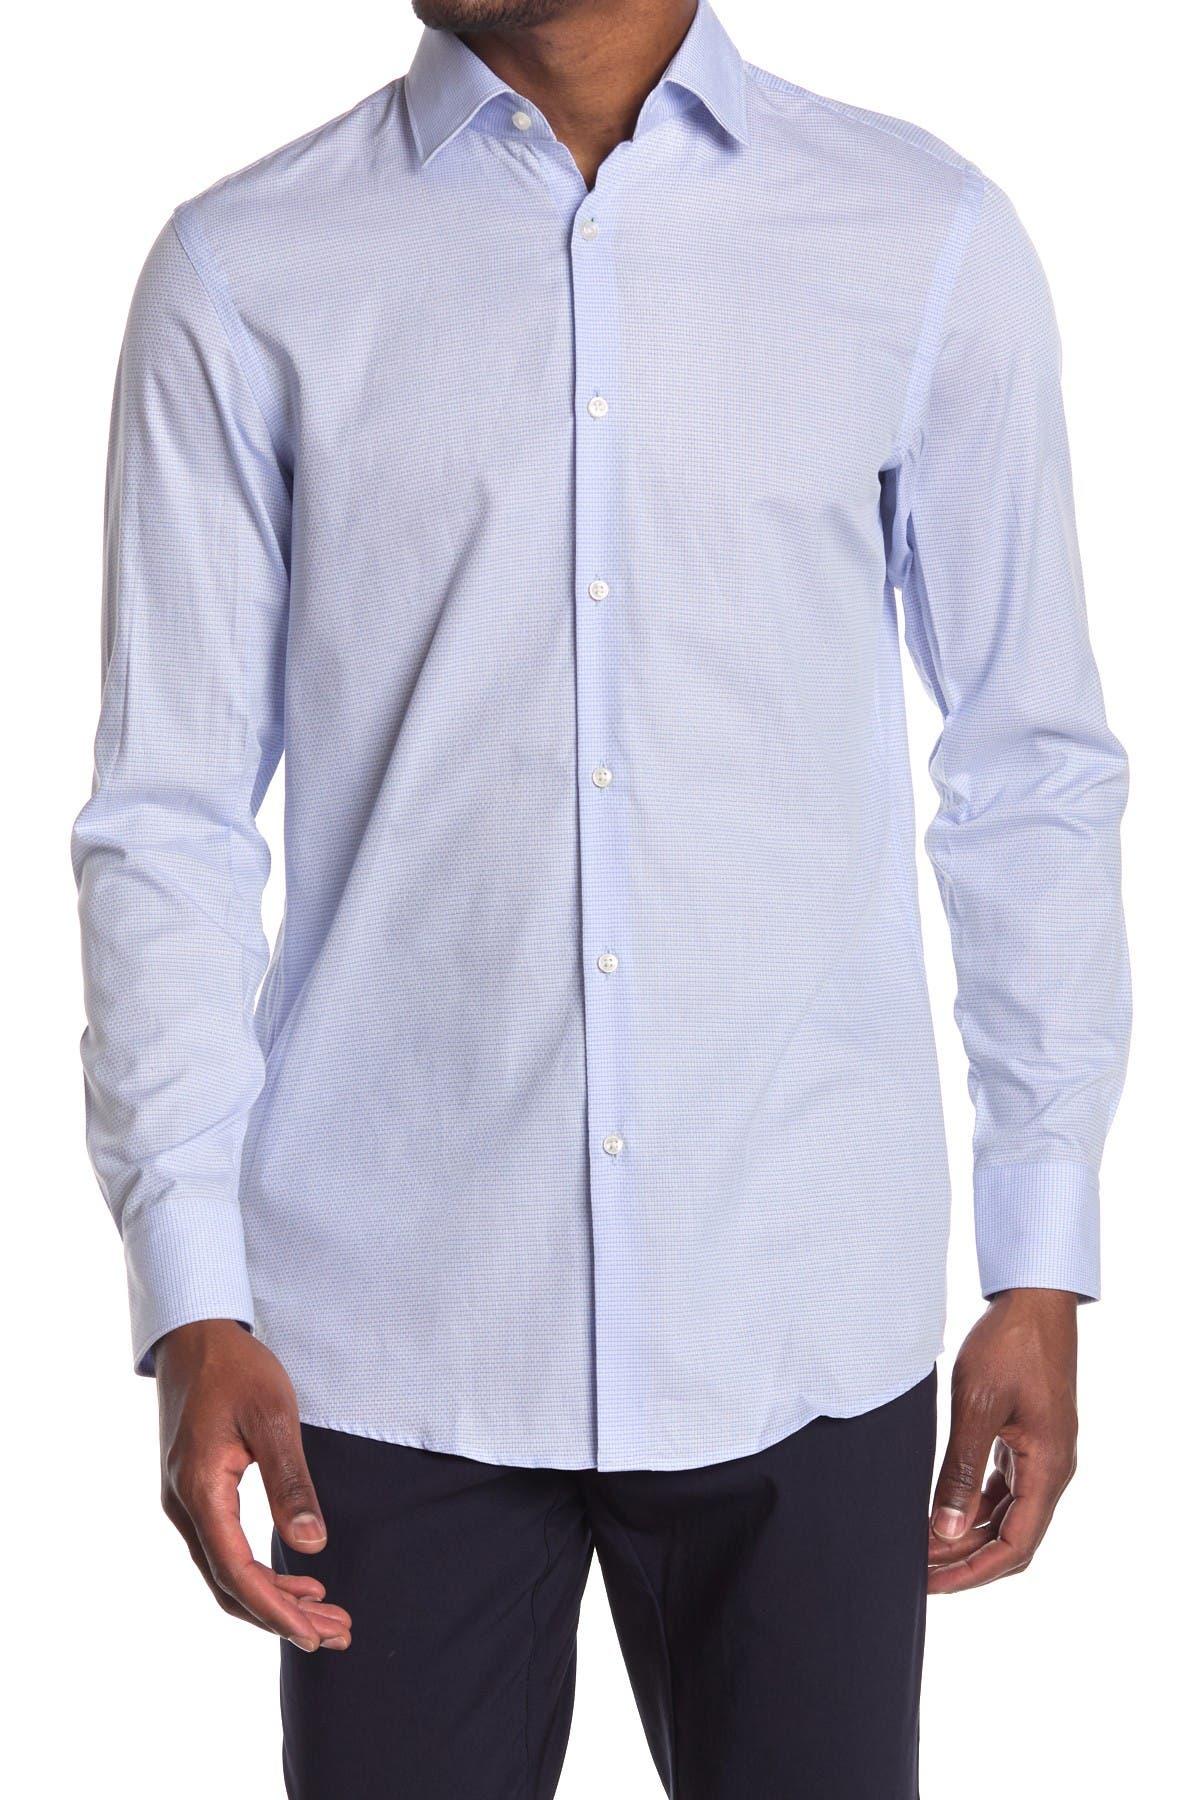 Image of BOSS Mabel Micro Print Long Sleeve Shirt